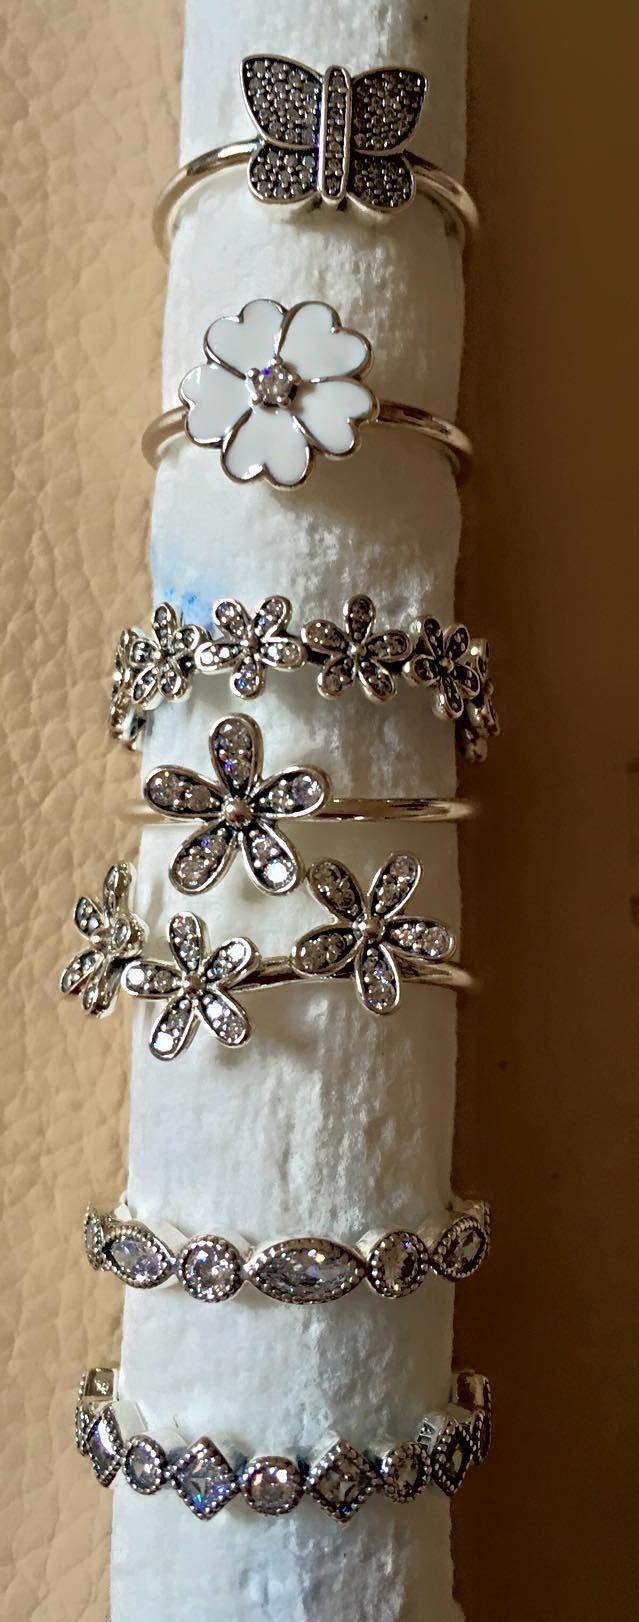 Pandora spring rings! WOMEN'S JEWELRY http://amzn.to/2ljp5IH